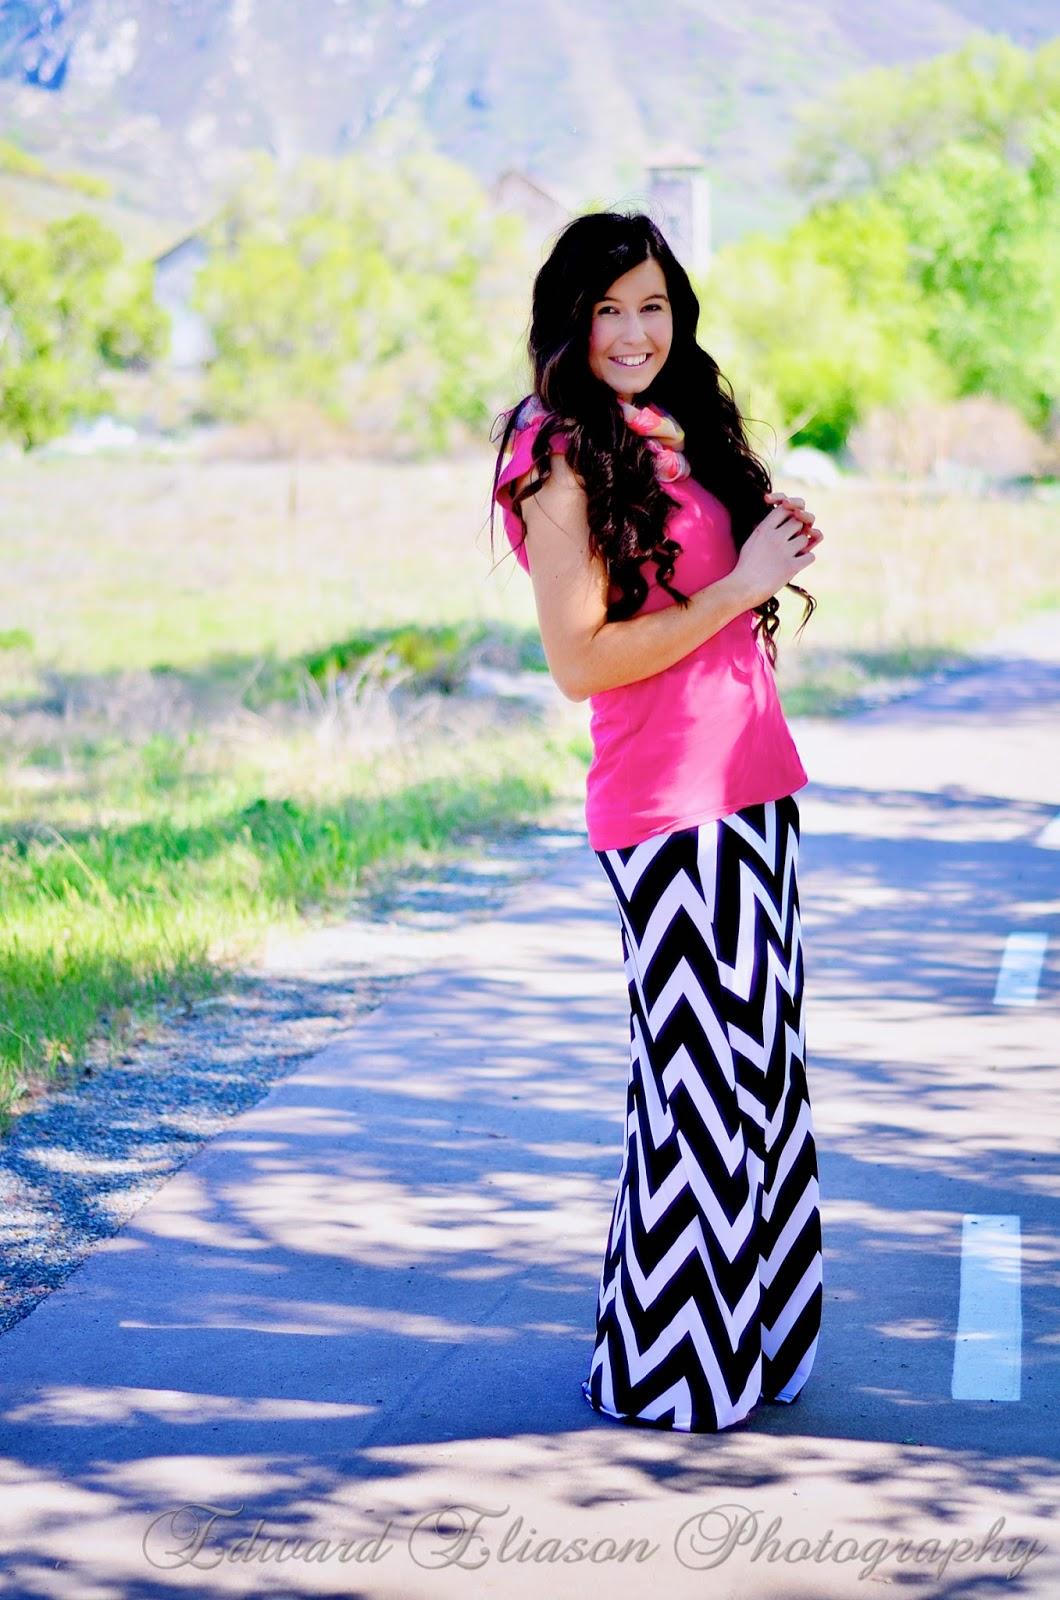 chevron maxi skirt, chevron print, chevron outfit, maxi skirt, striped maxi skirt, pink and chevron, the old mill, cottonwood canyon, old mill, pretty,